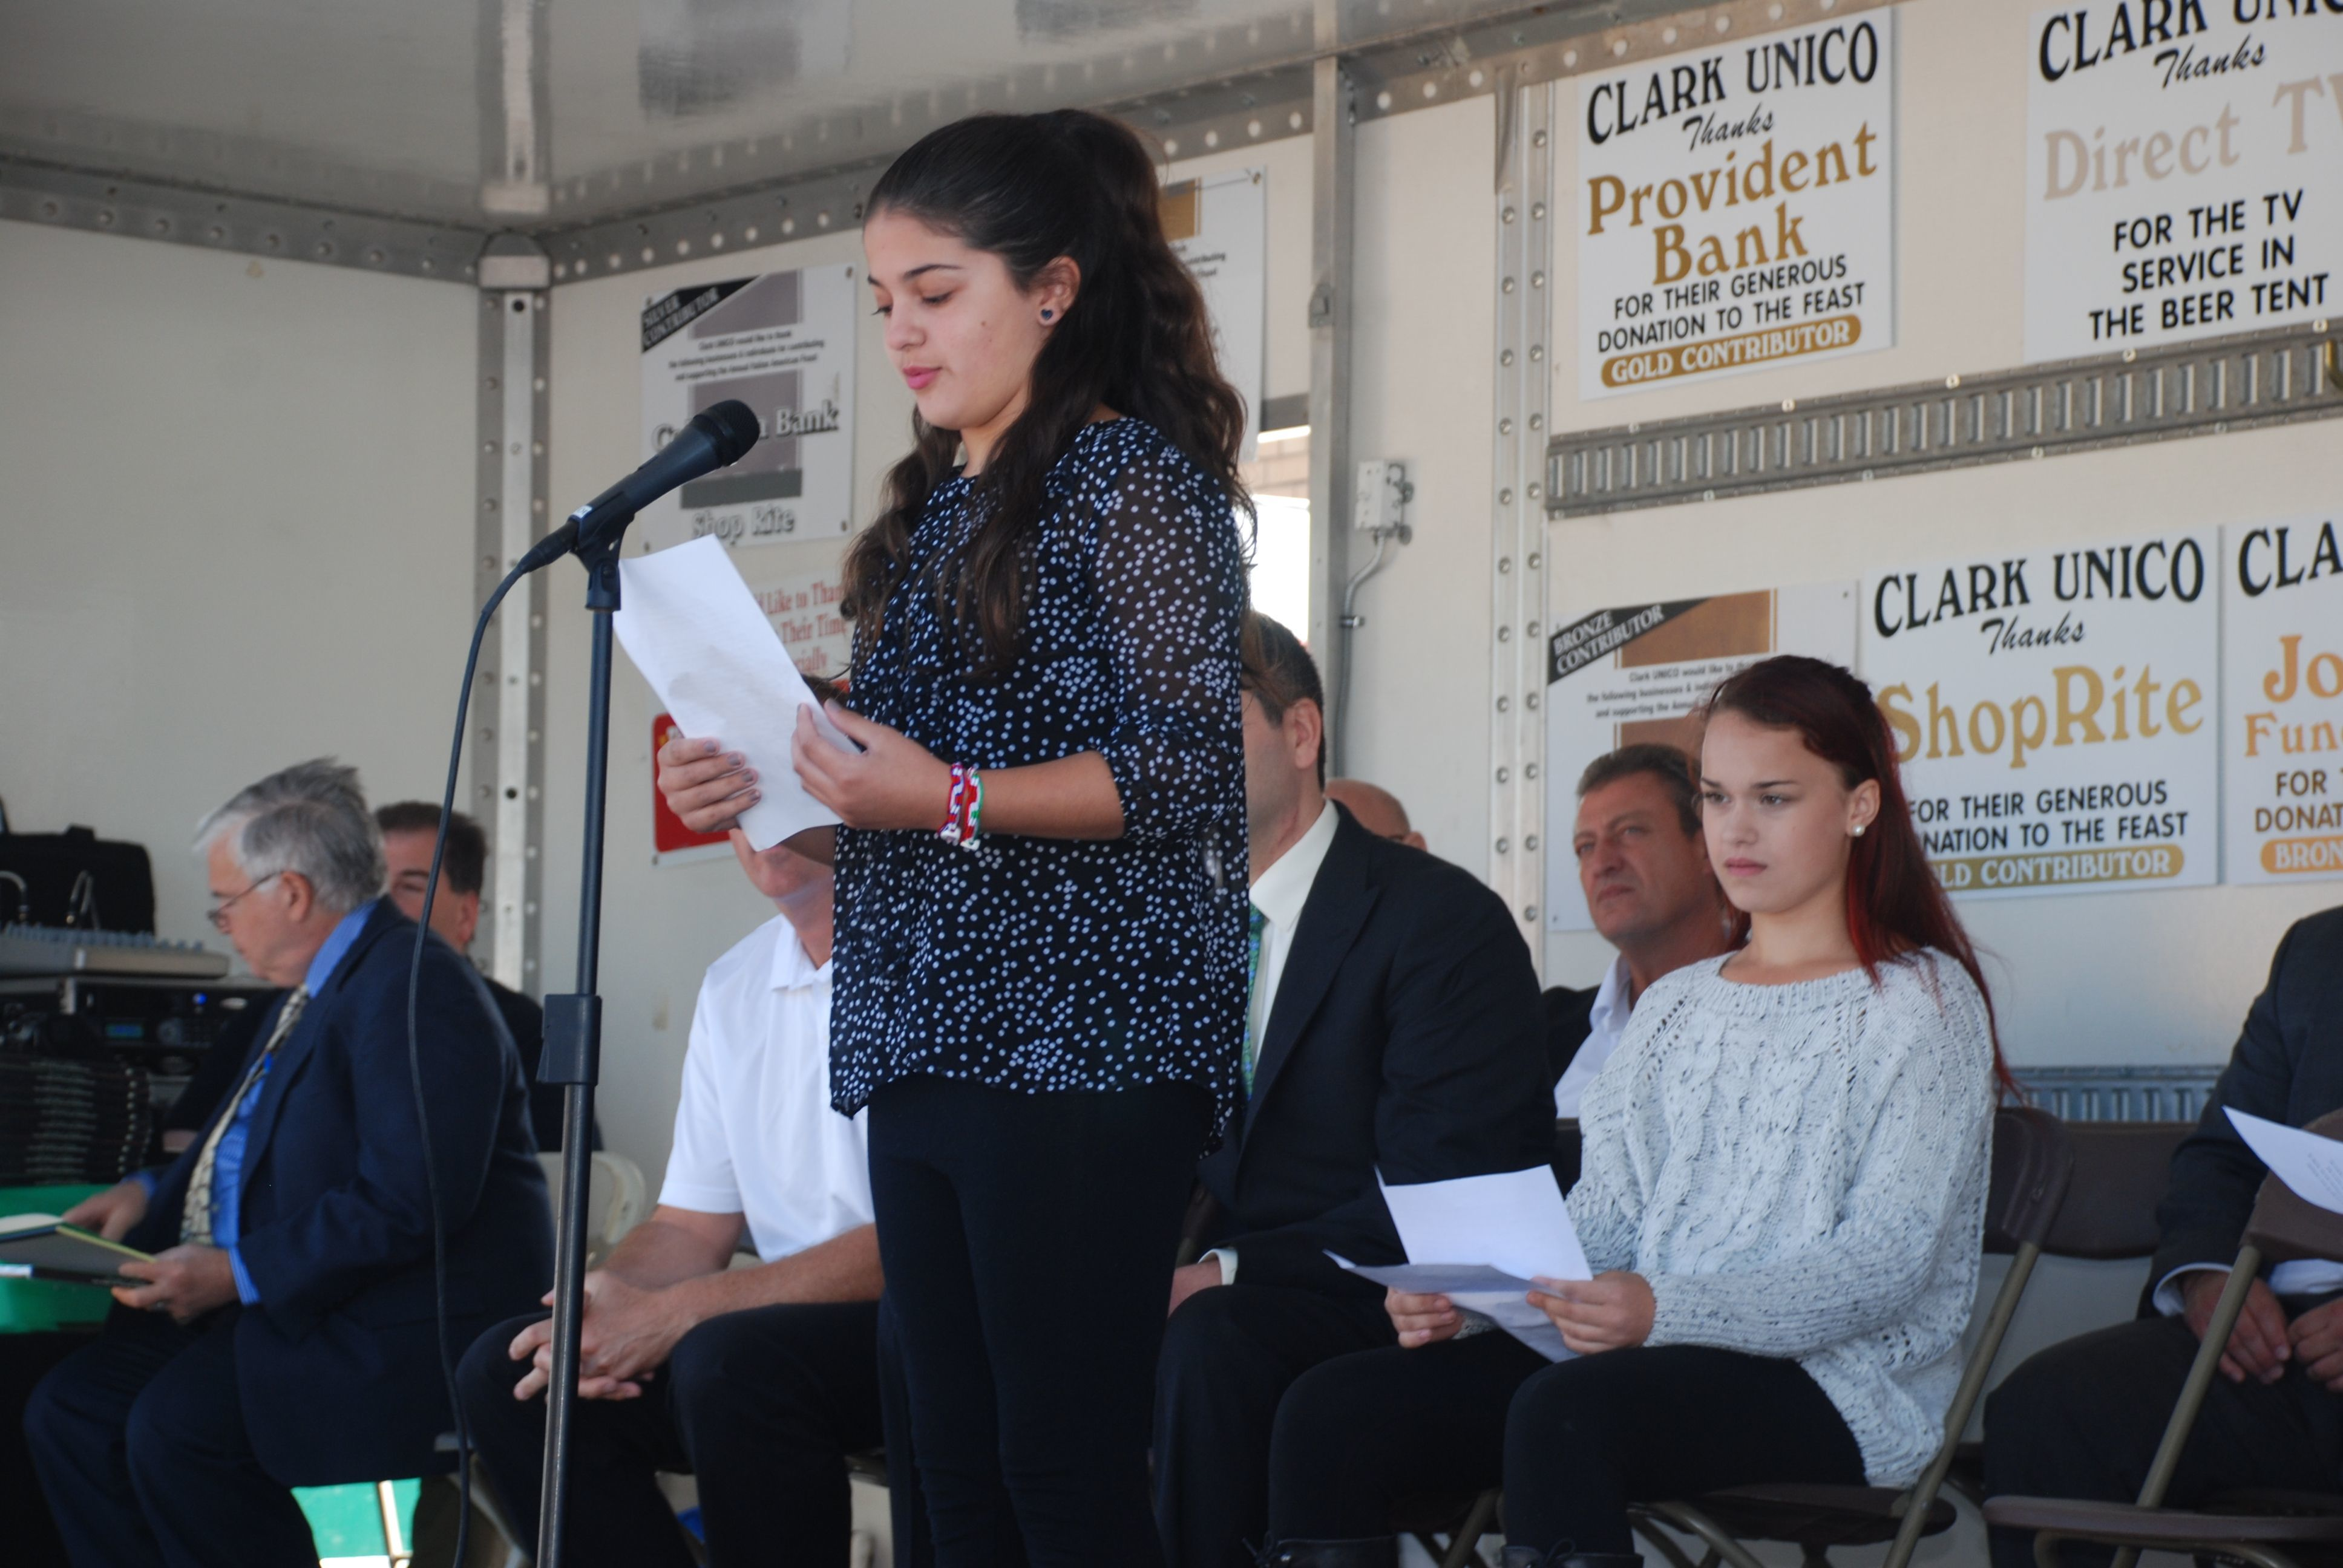 columbus remembered italian americans honored at clark unico valley road school essay winner gina galiszewski credits susan roselli bonnell